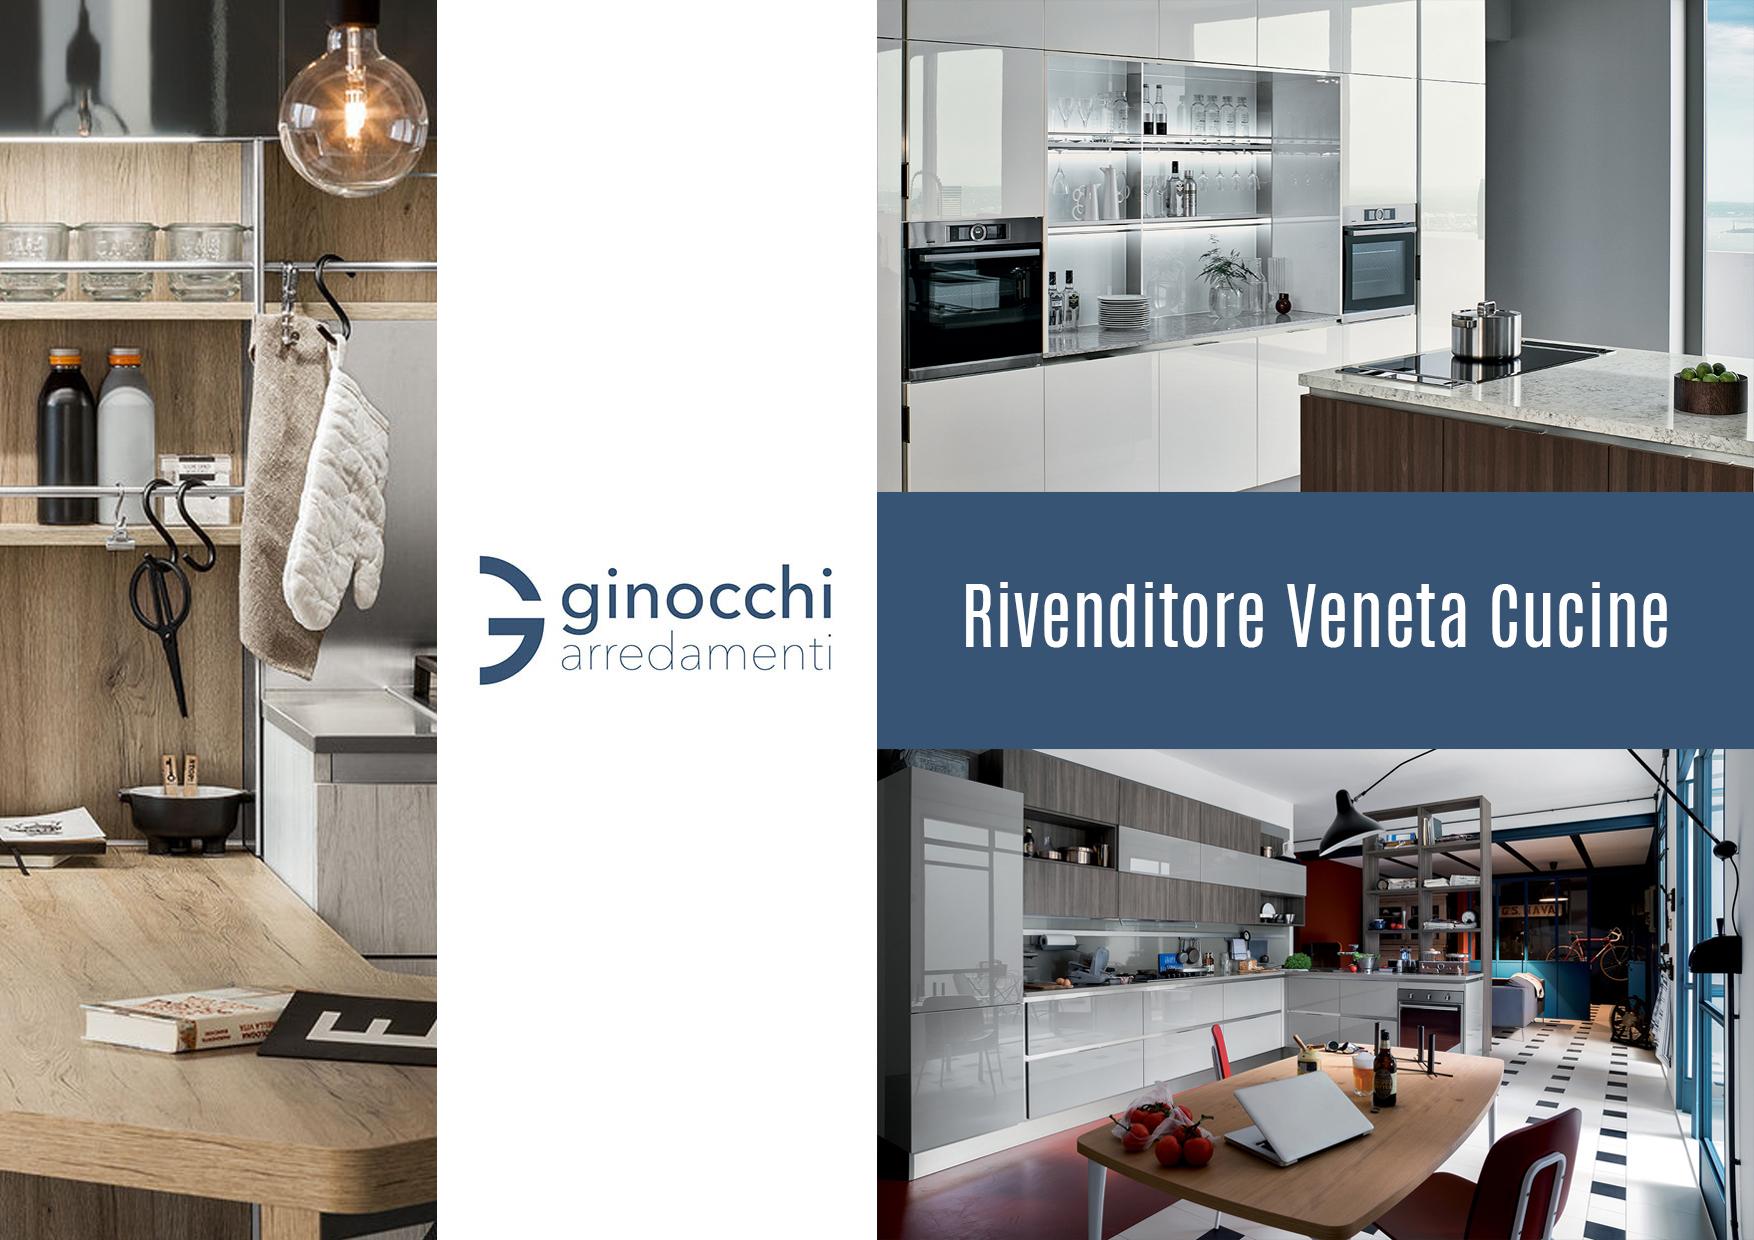 Catalogo Top Veneta Cucine.Rivenditore Veneta Cucine Ginocchi Arredamenti